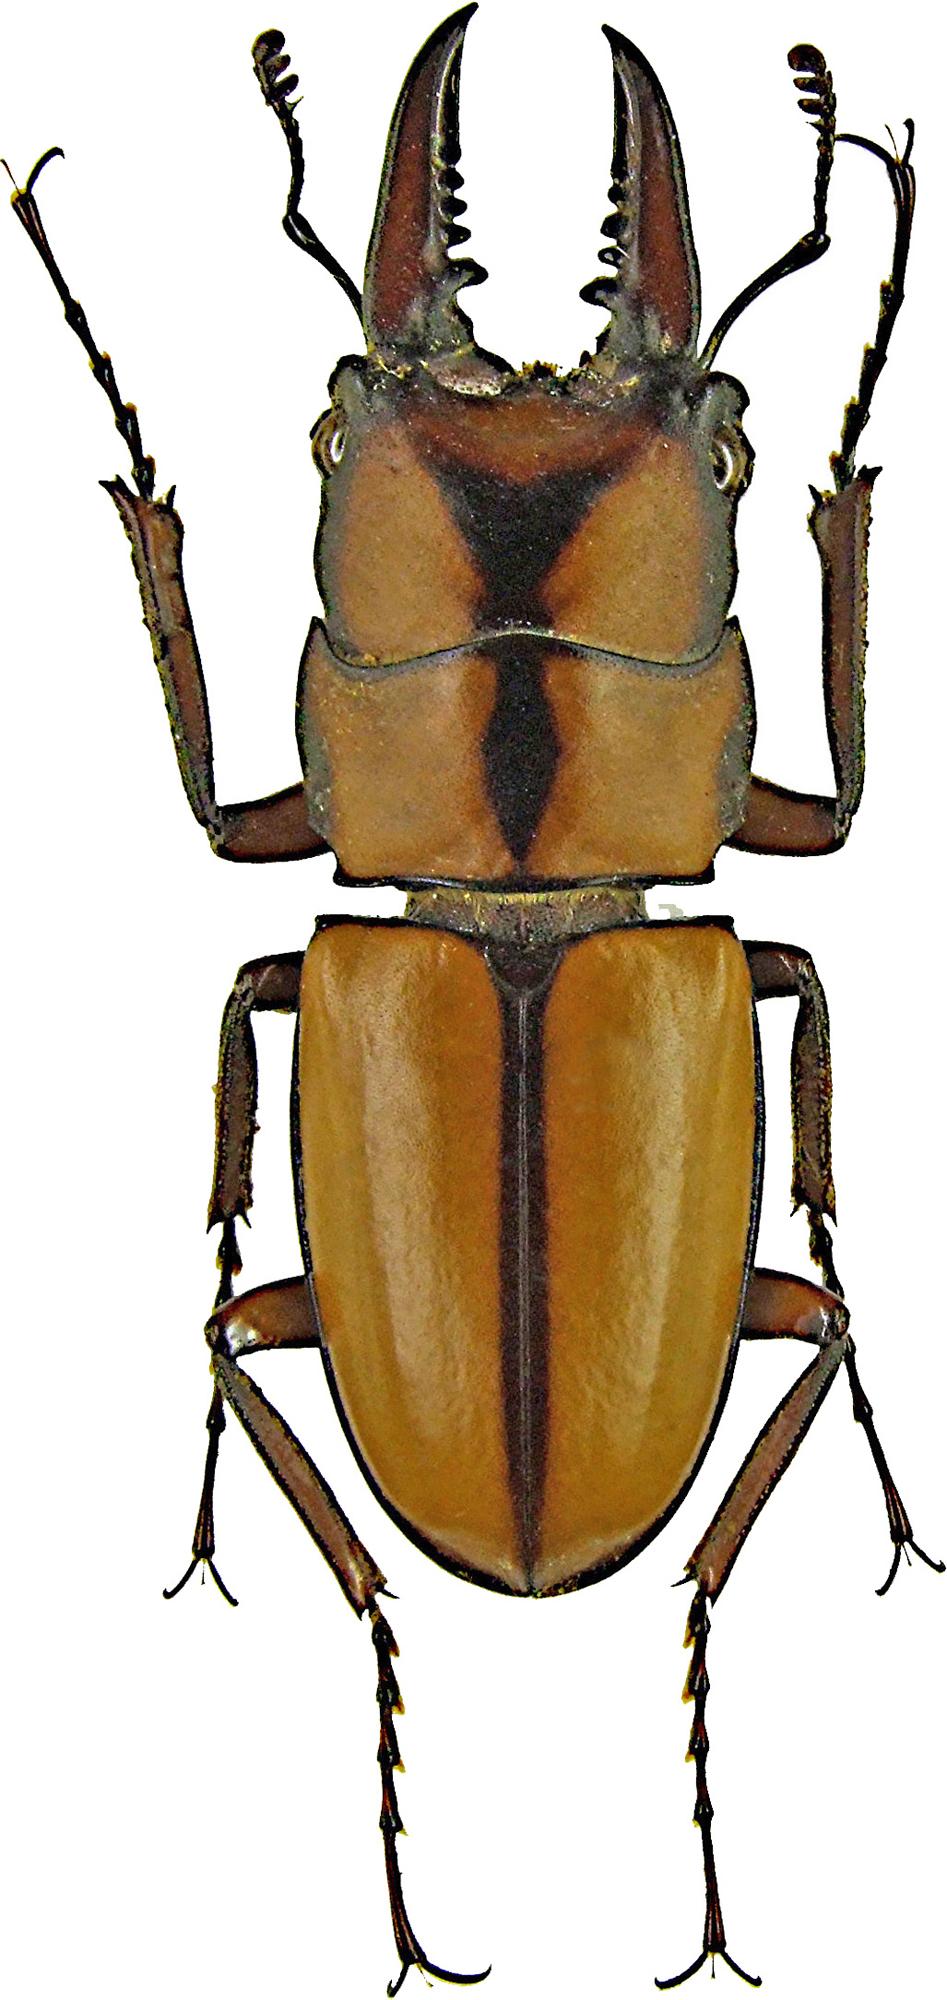 Prosopocoilus (Metopodontus) kannegieteri 1200.jpg